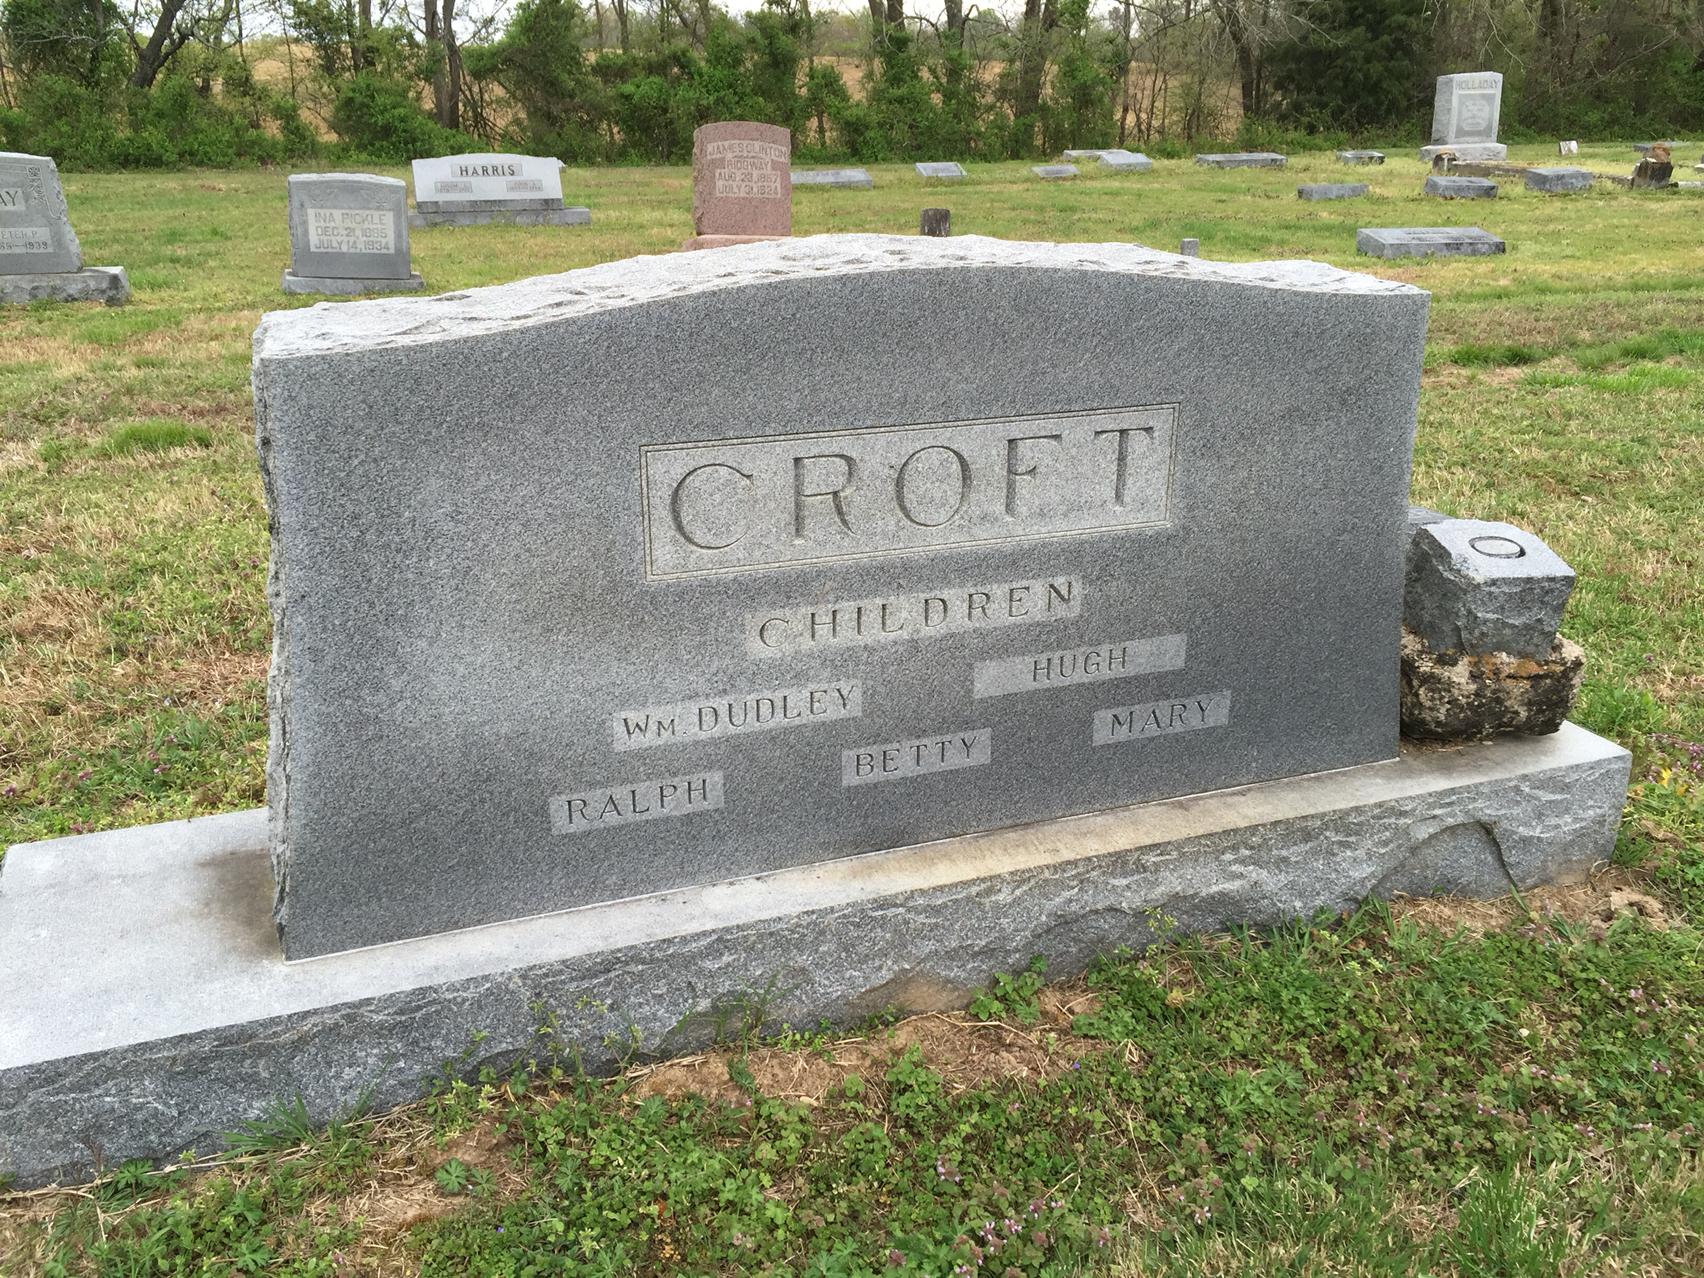 Oswald Congrave Croft